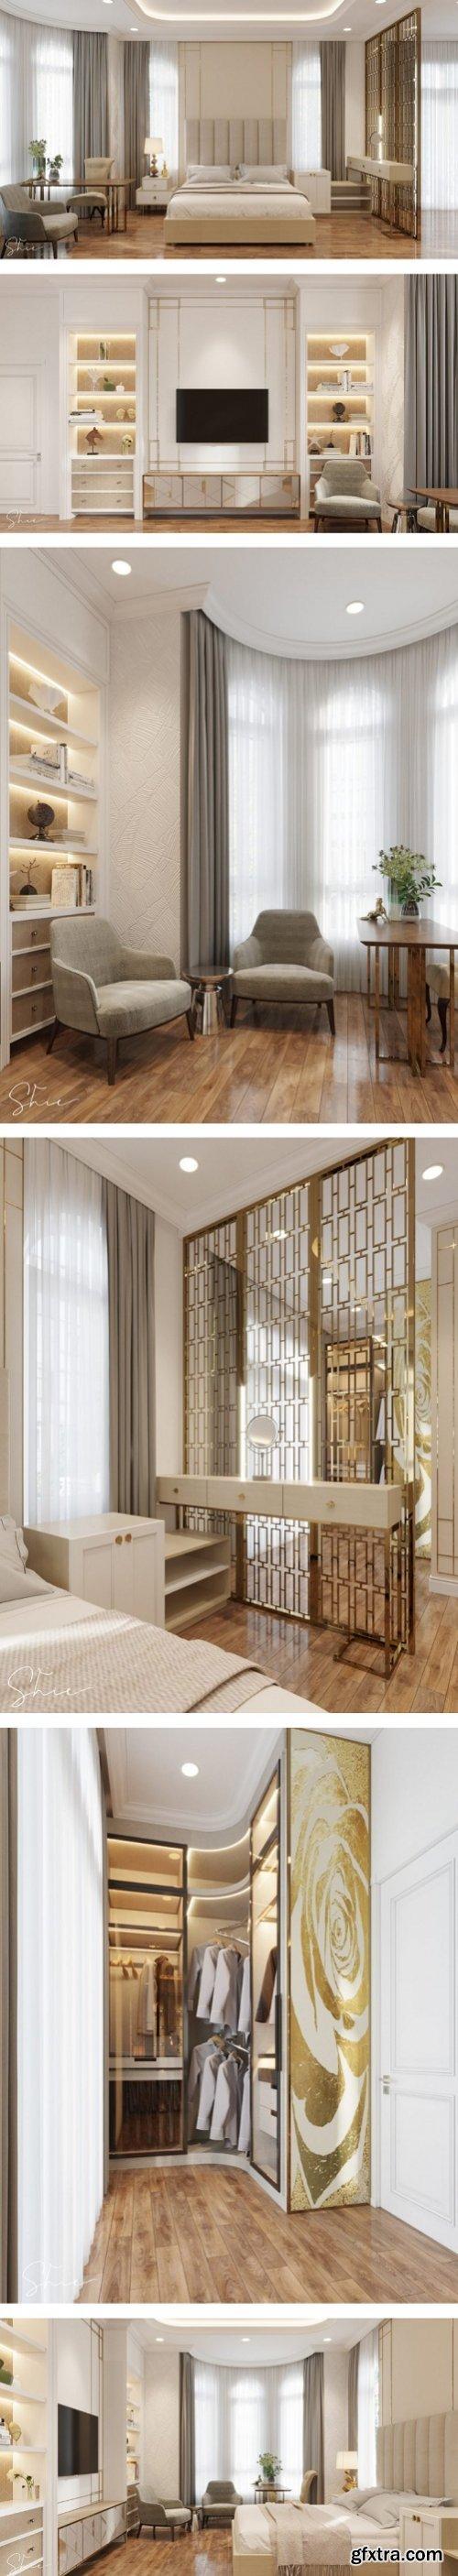 3D Interior Scene Bedroom By AnNguyen